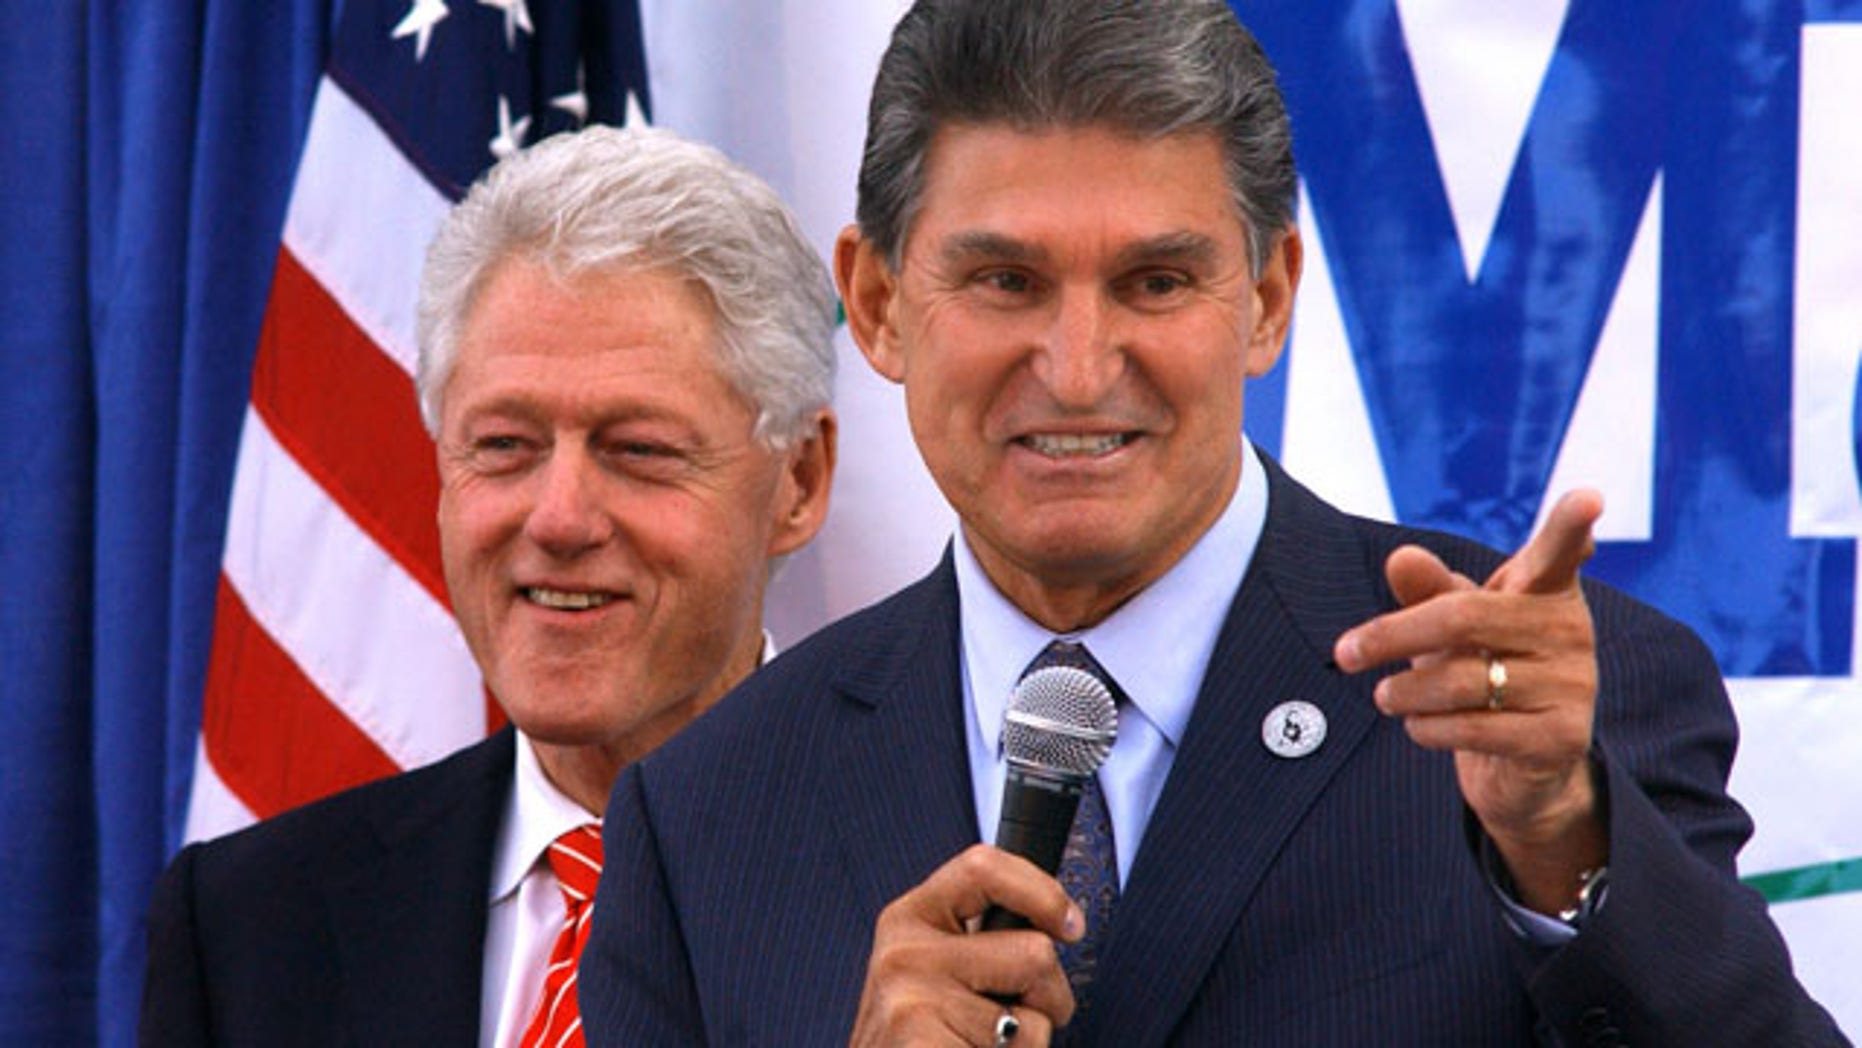 Nov. 1: Former president Bill Clinton smiles as W.Va. Governor Joe Manchin campaigns at Tamarack in Beckley, W.Va.